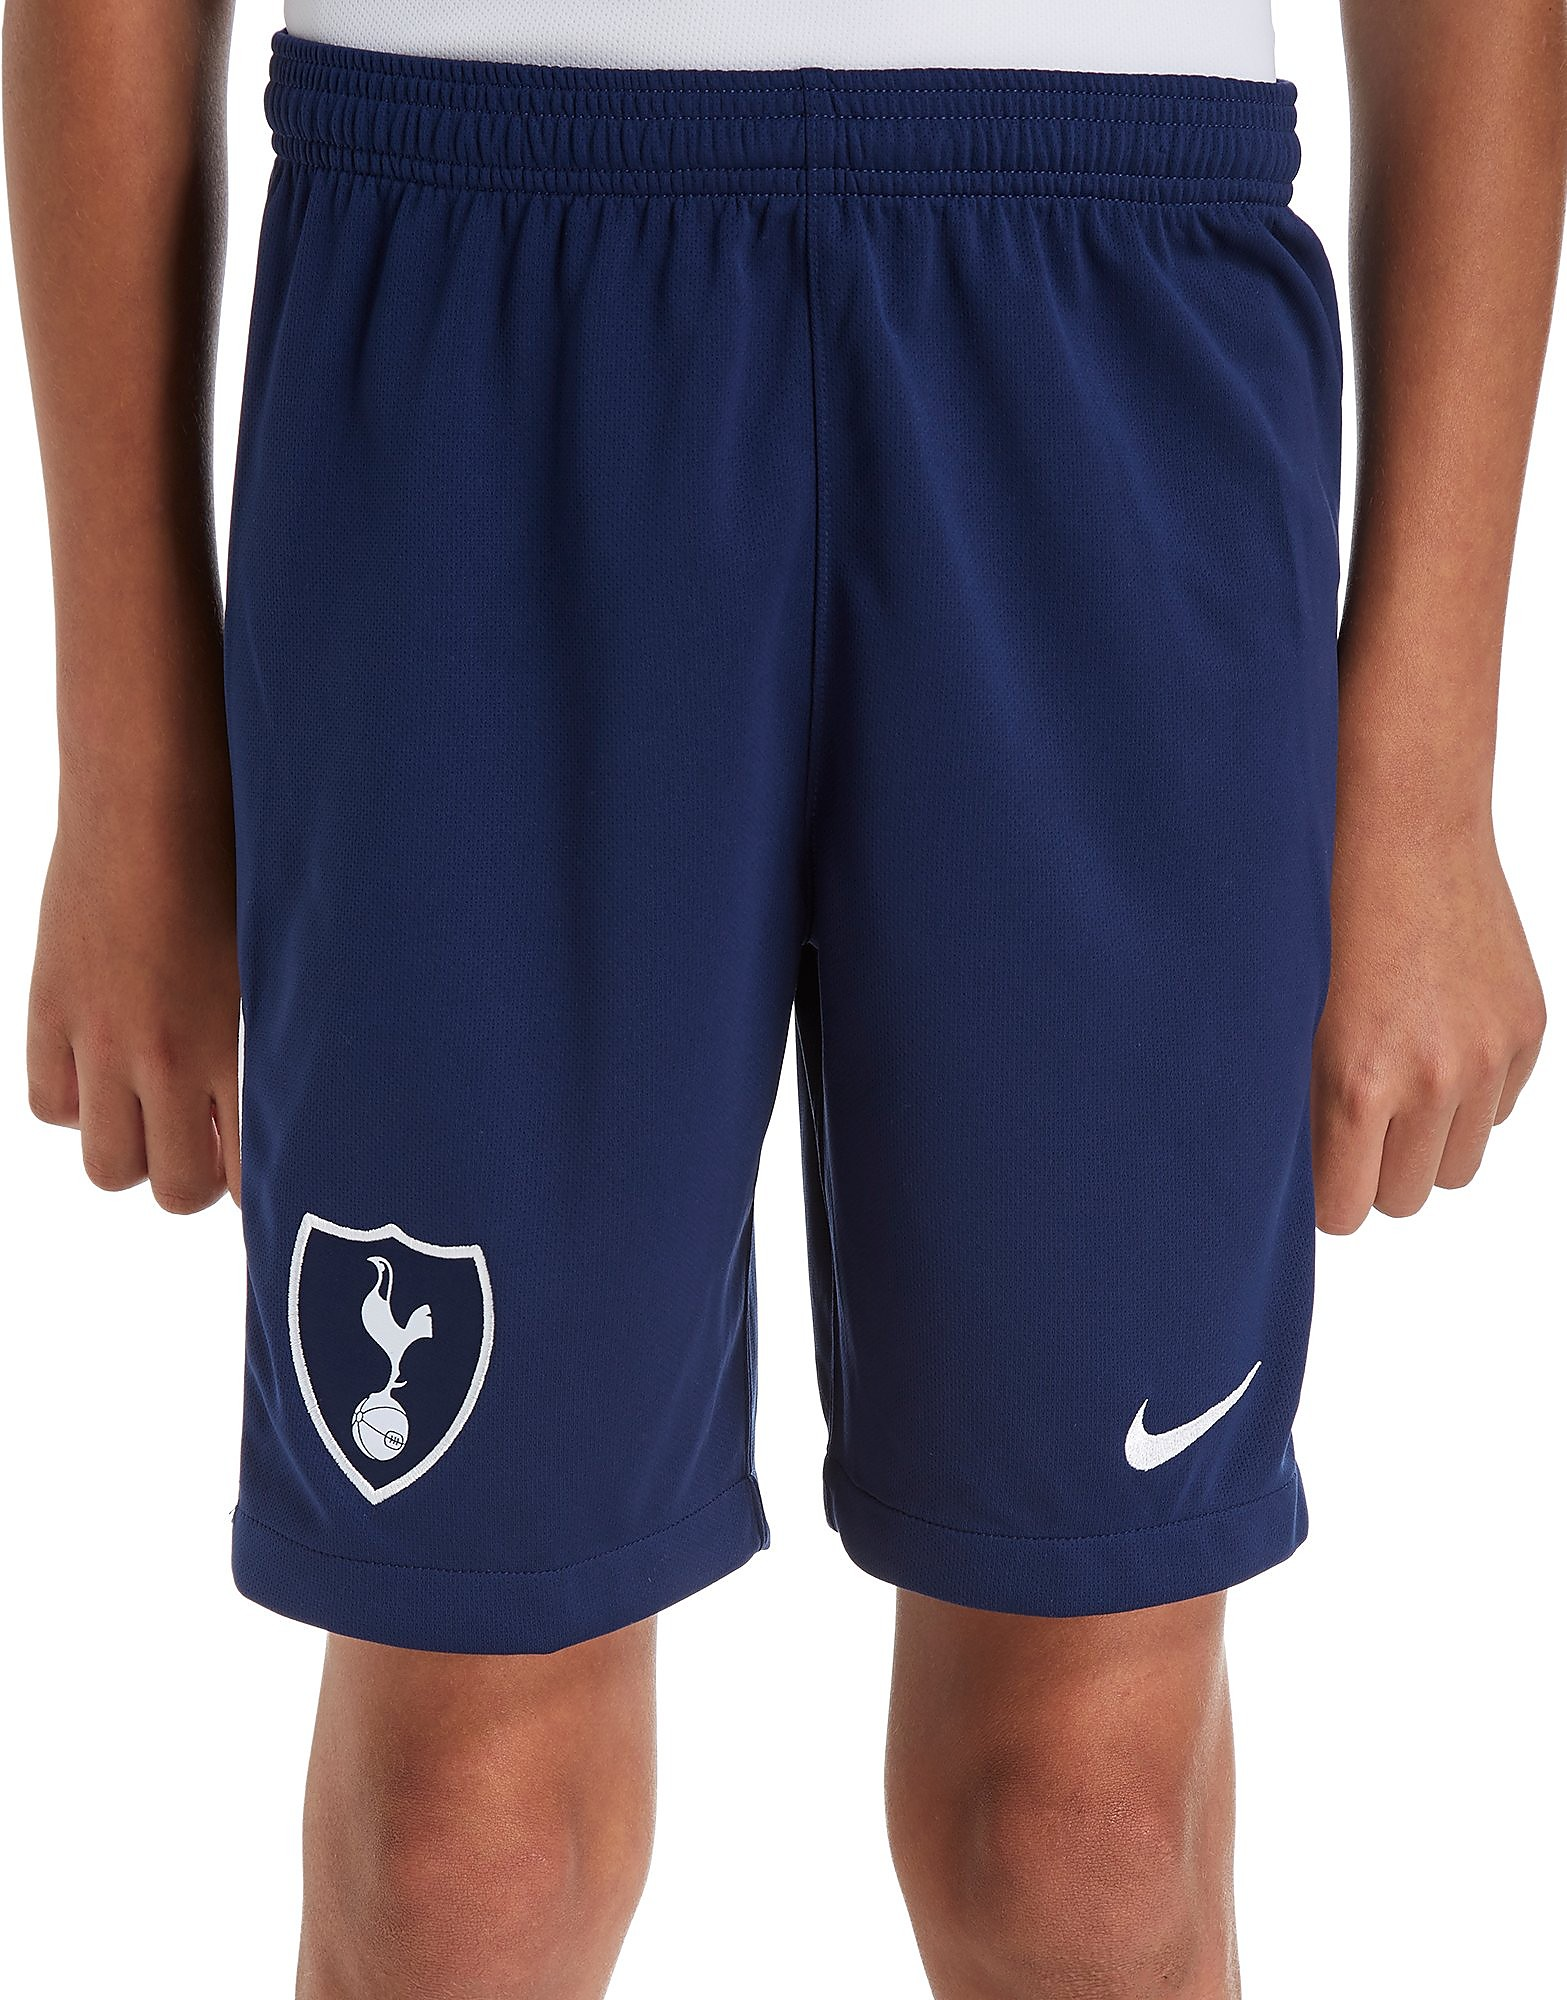 Nike Tottenham Hotspur 2017/18 Home Shorts Junior